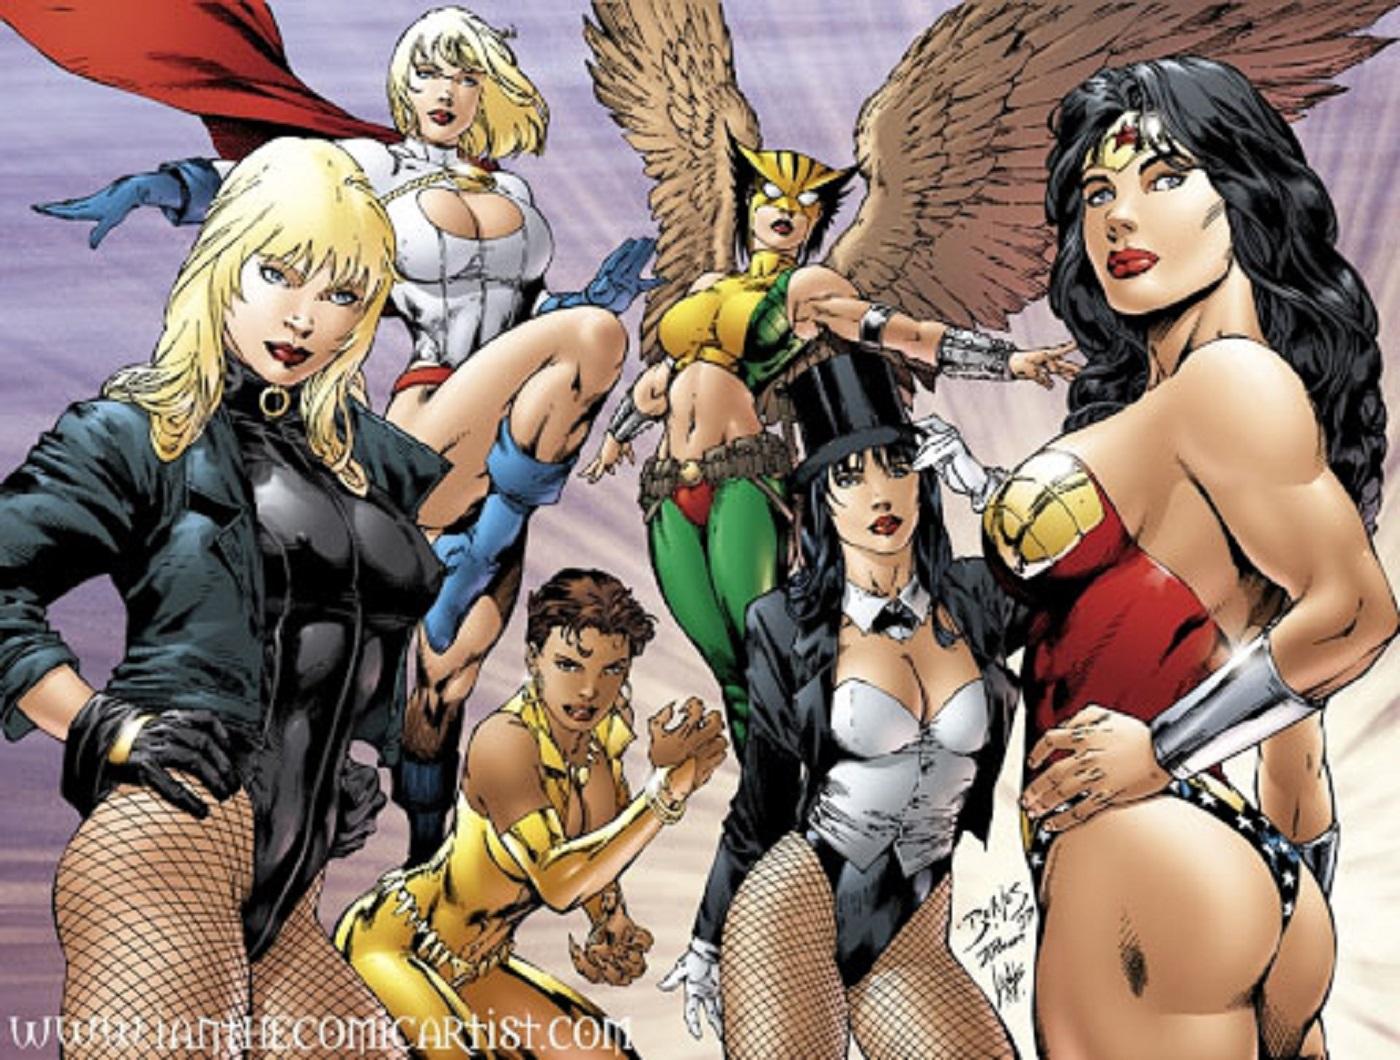 Hyper-Sexualization In Video Games & Comics